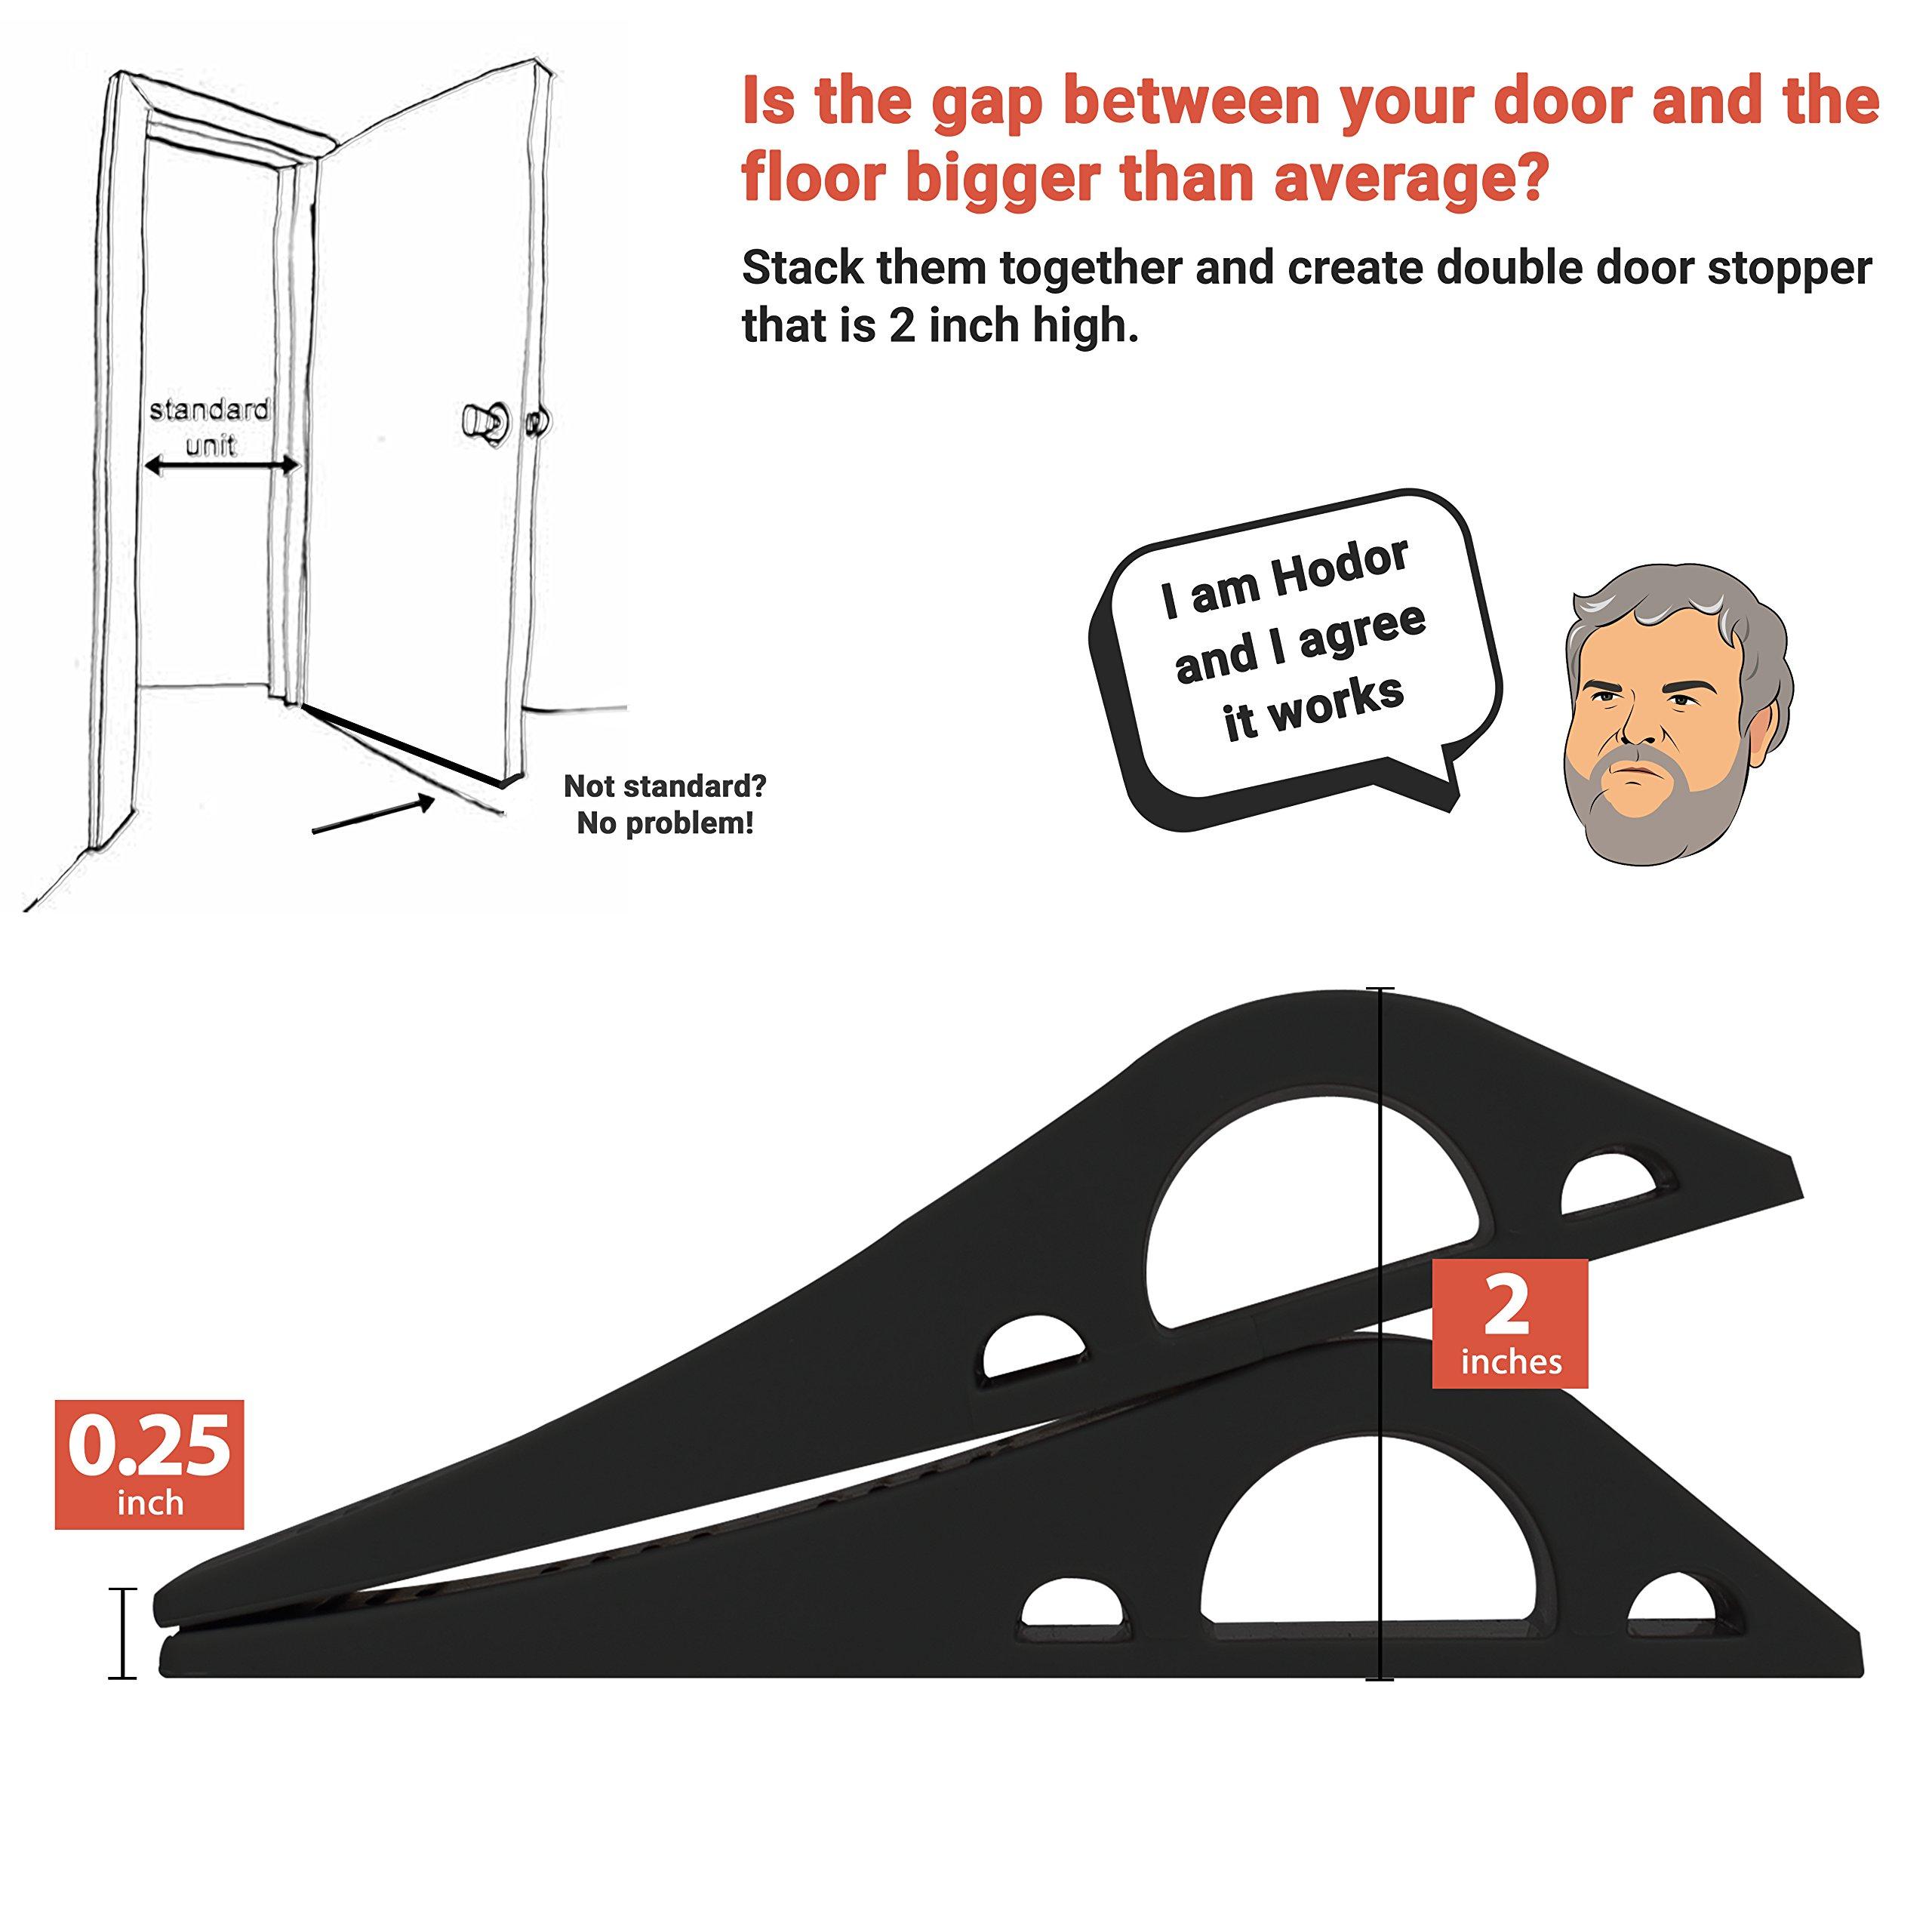 Wundermax Decorative Door Stopper with Free Bonus Holders, Door Stop Works on All Floor Surfaces, Premium Rubber Door Stops, The Original (3 Pack, Black) by Wundermax (Image #6)